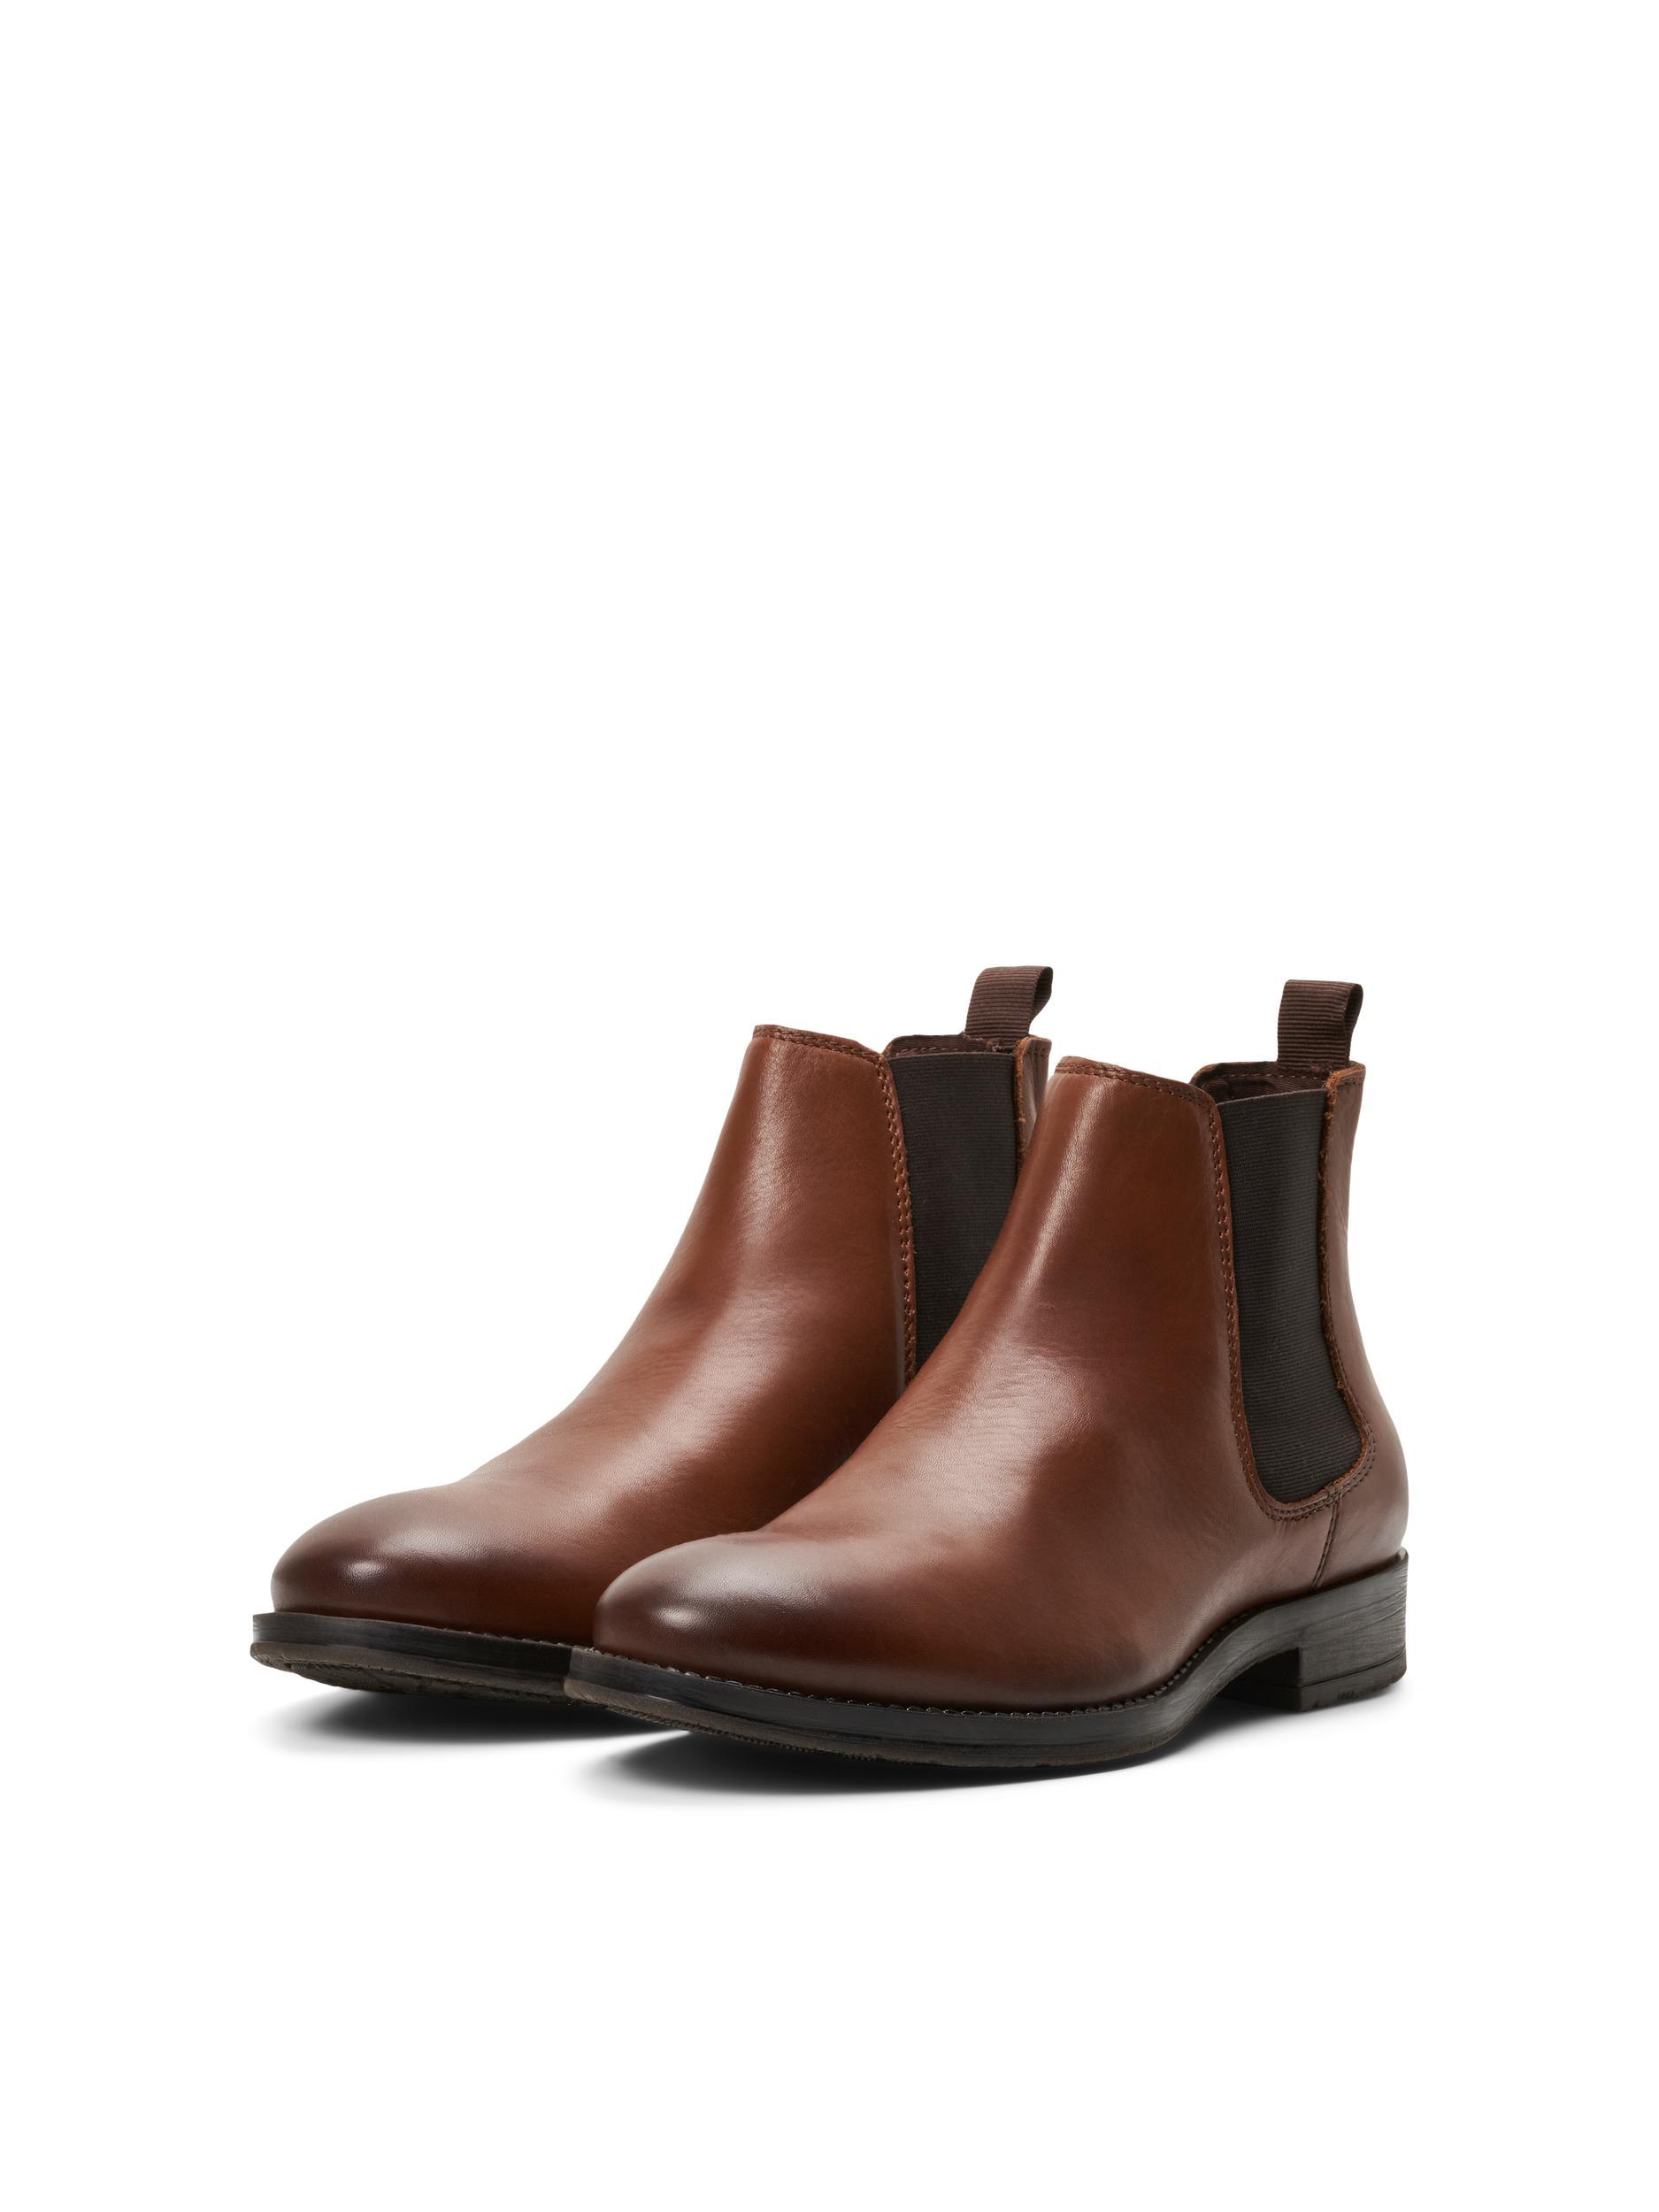 Jack and Jones læder støvler, Cognac, 46